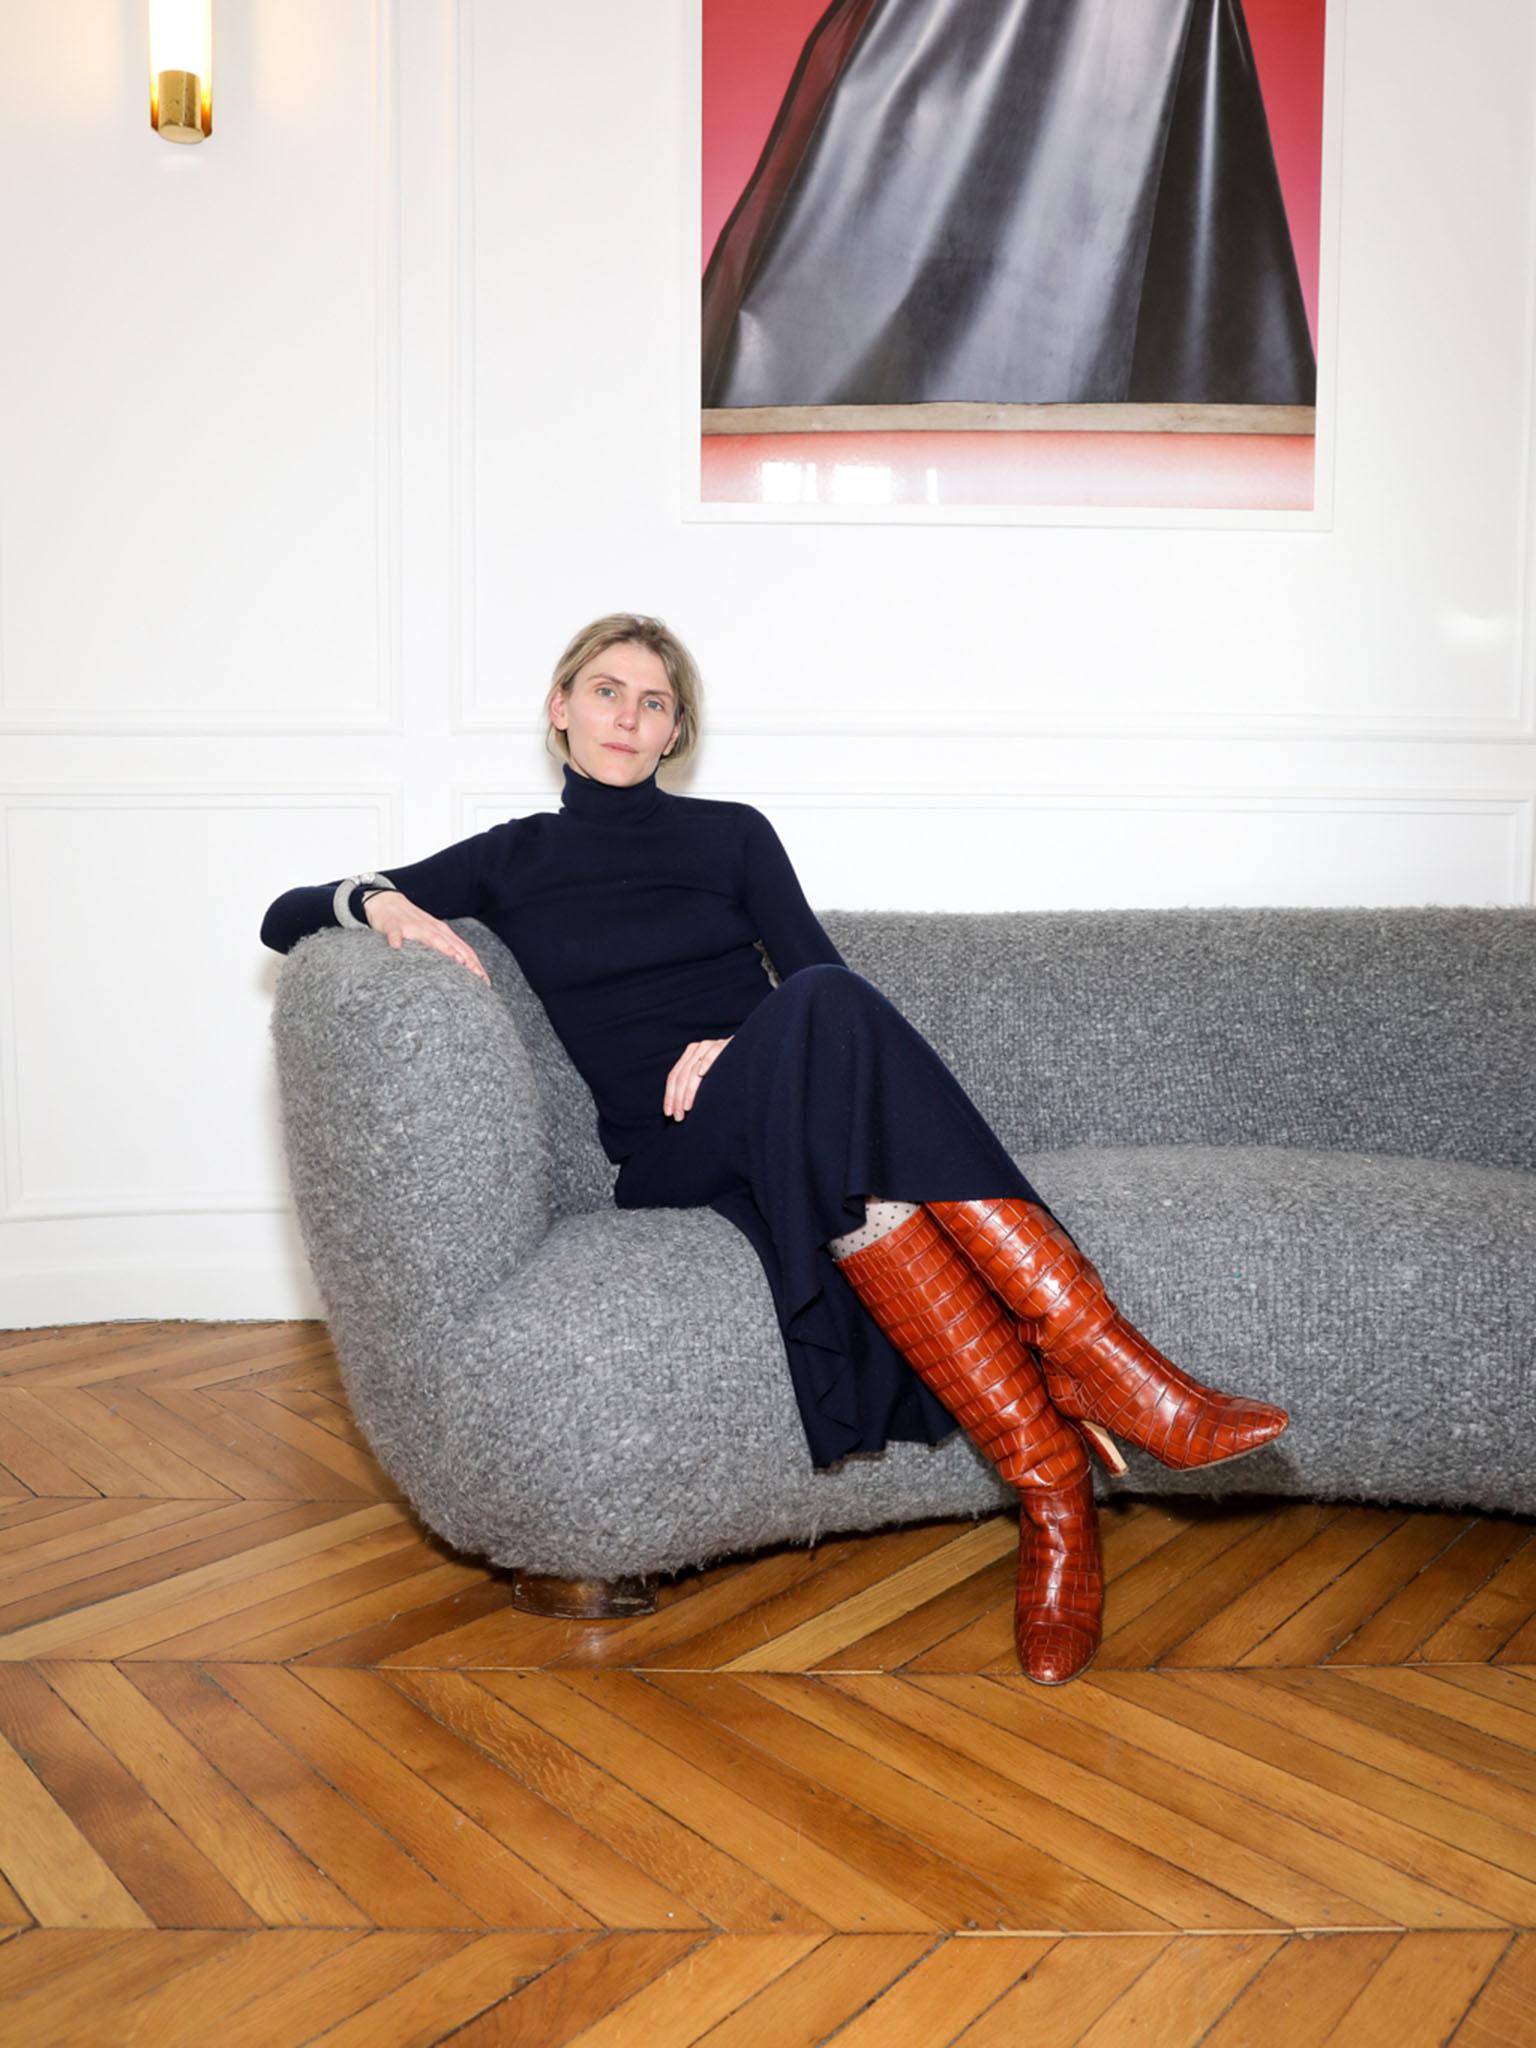 Gabriela Hearst's Paris showroom